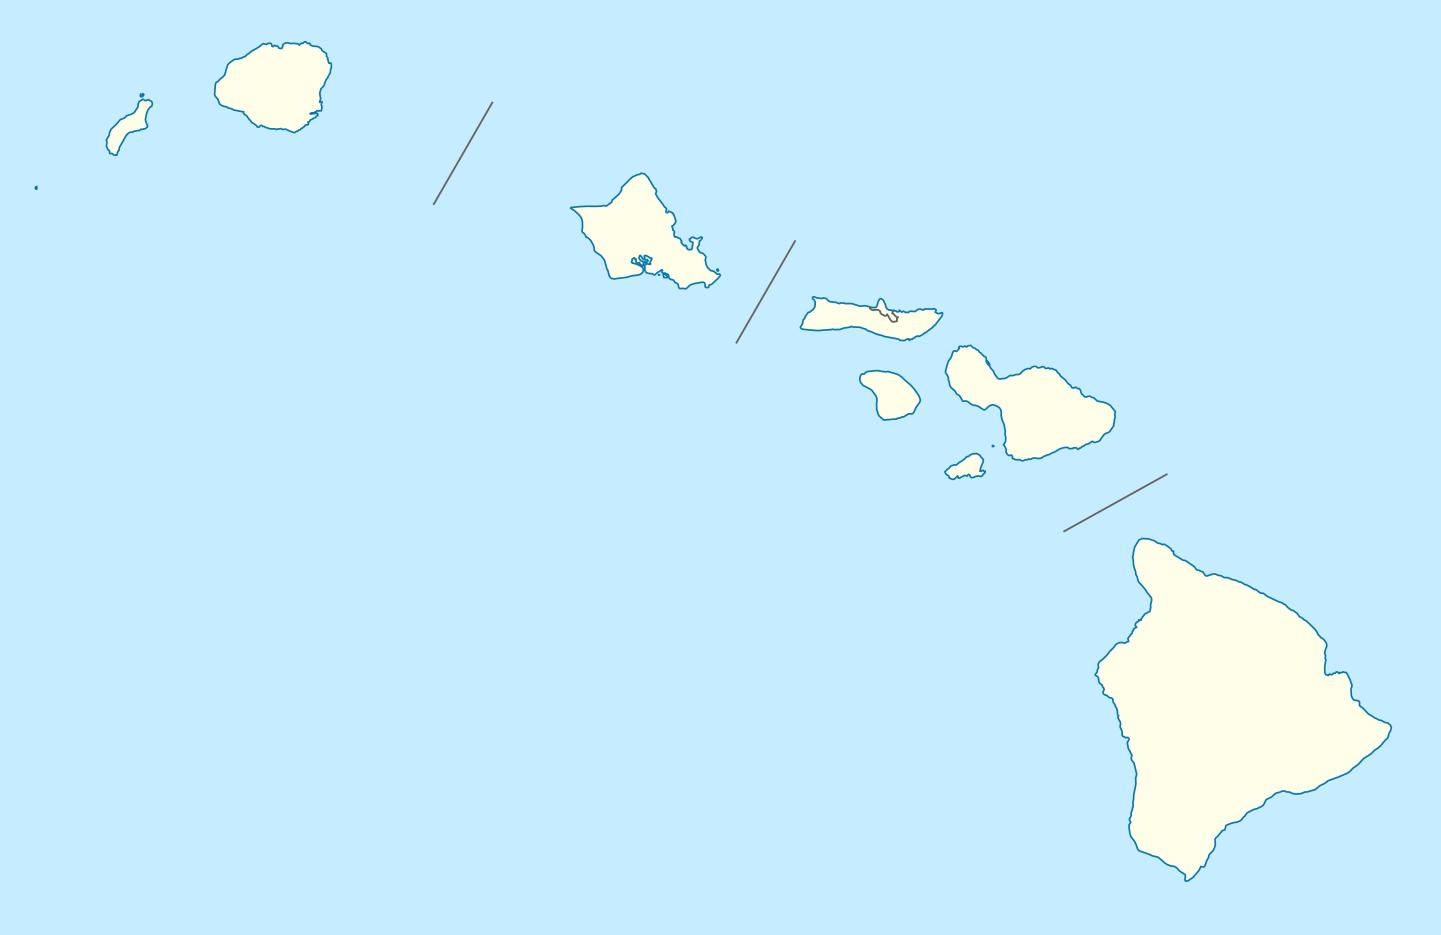 File:USA Hawaii location map.svg.